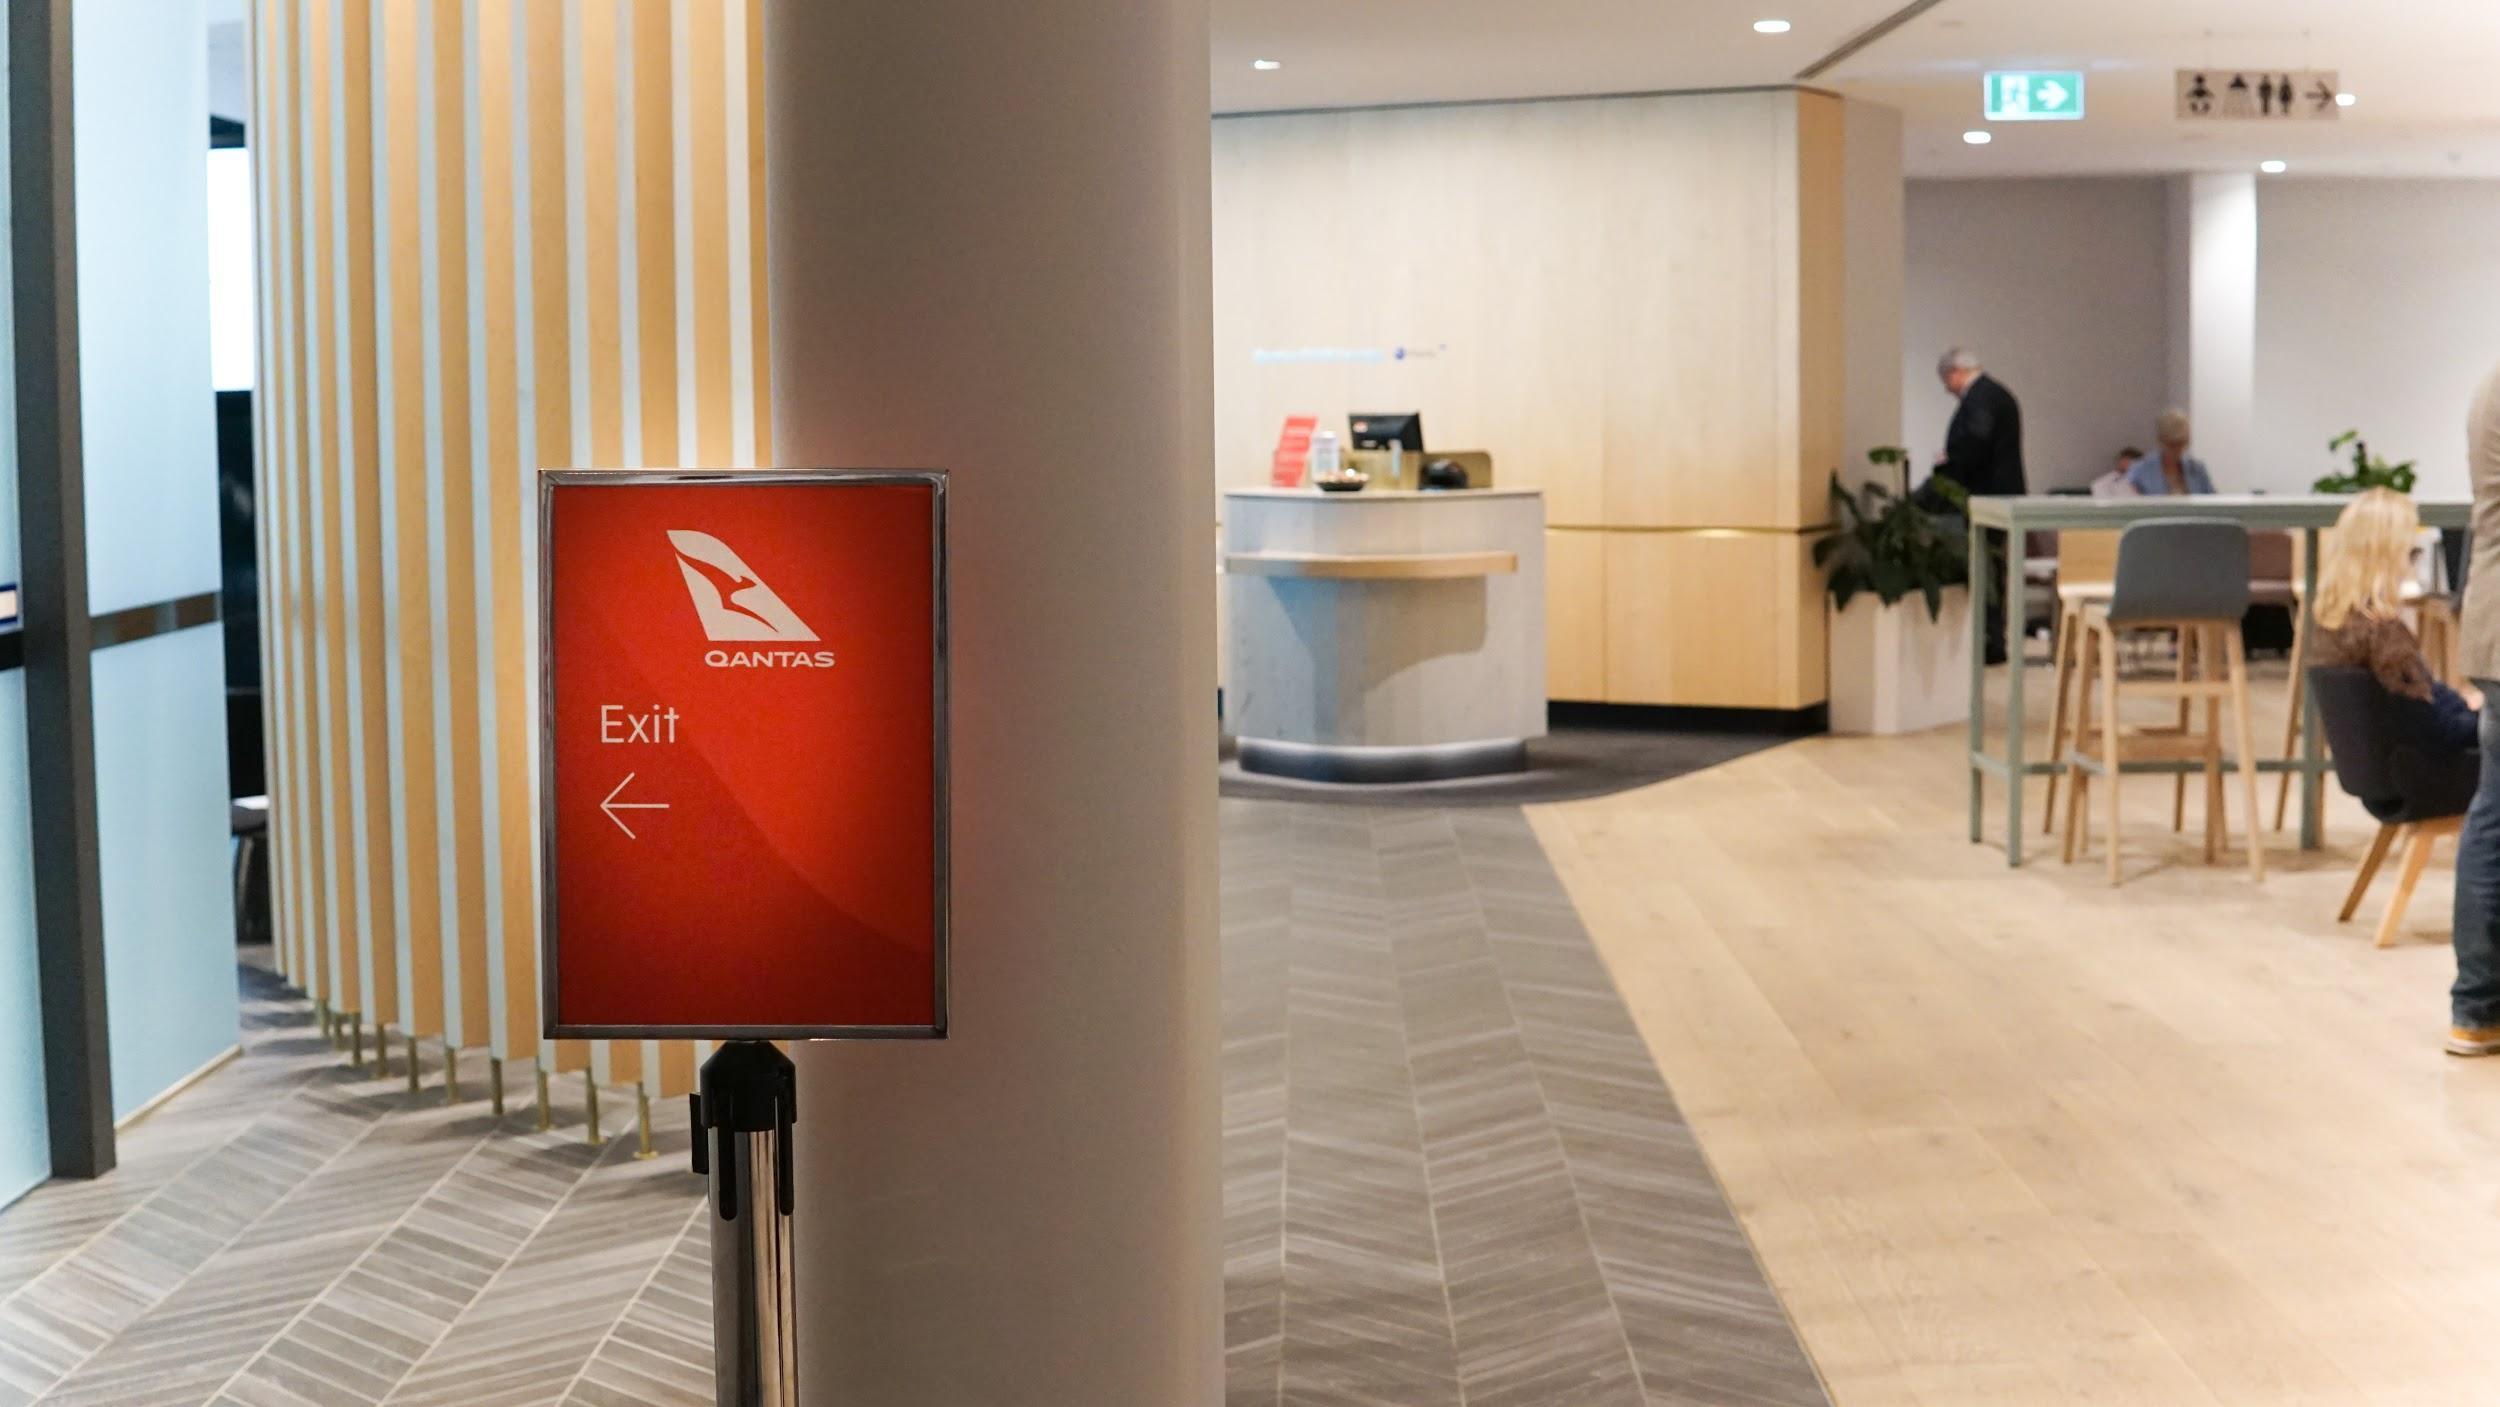 Qantas Club Melbourne exit